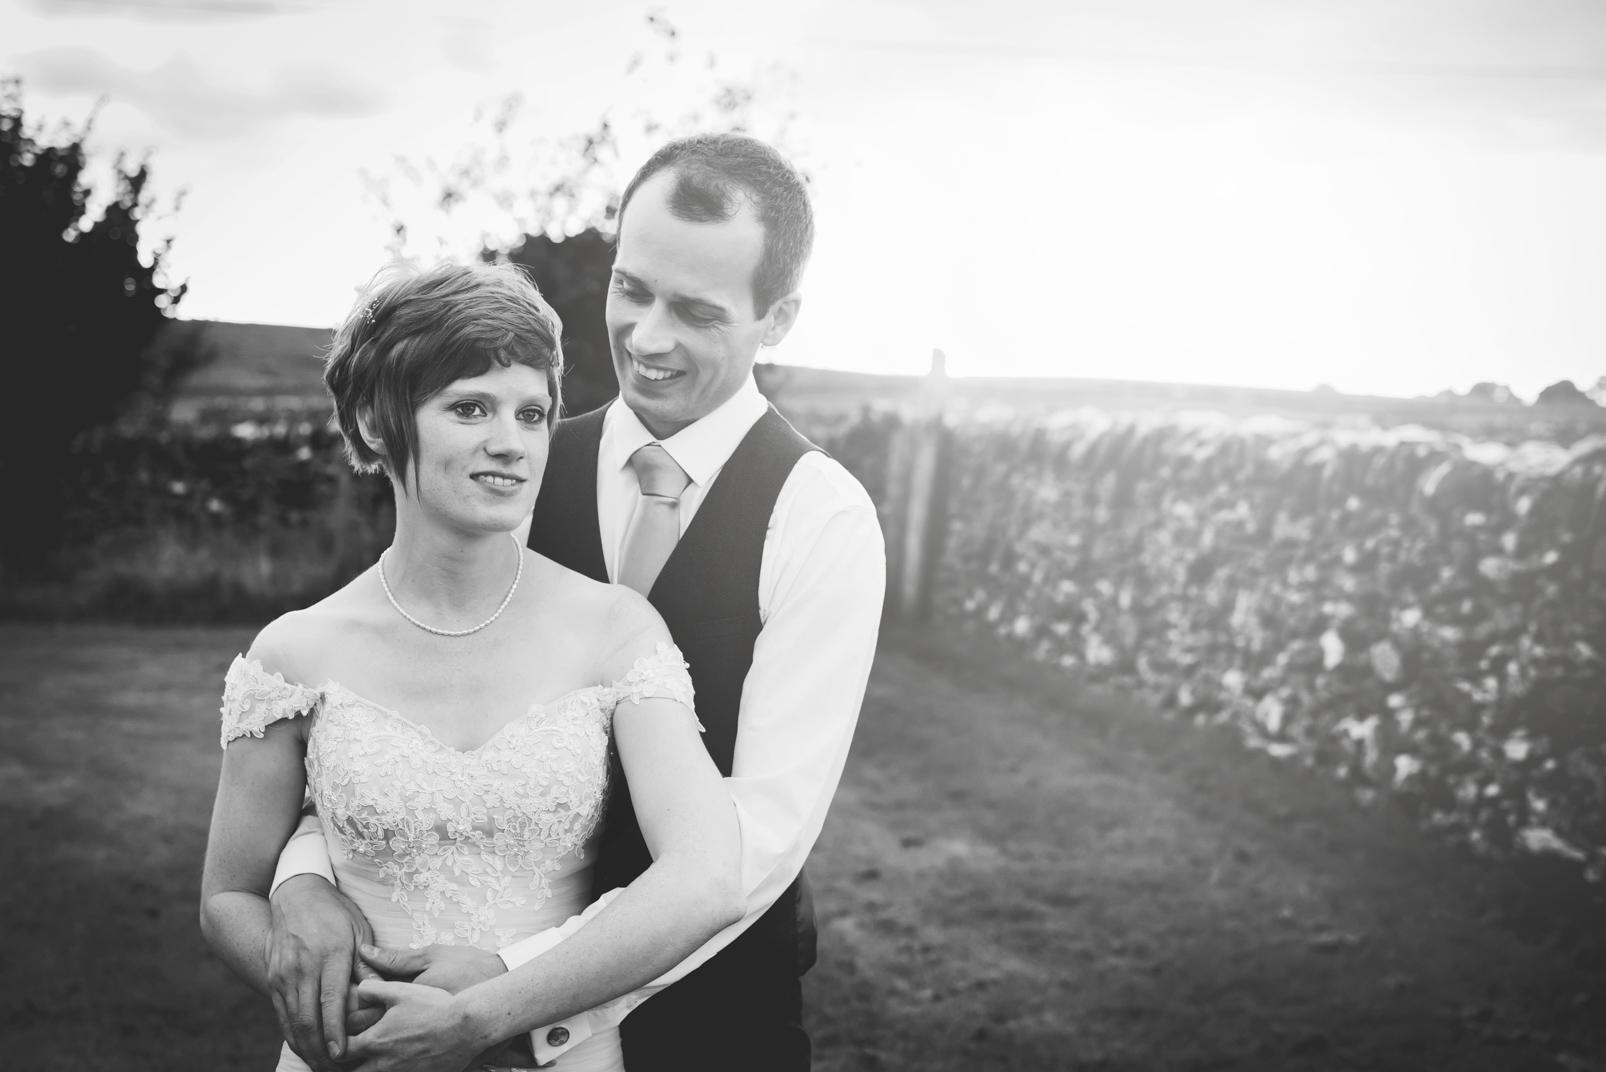 Peak+district+farm+wedding+lower+damgate+photographer-204.jpg